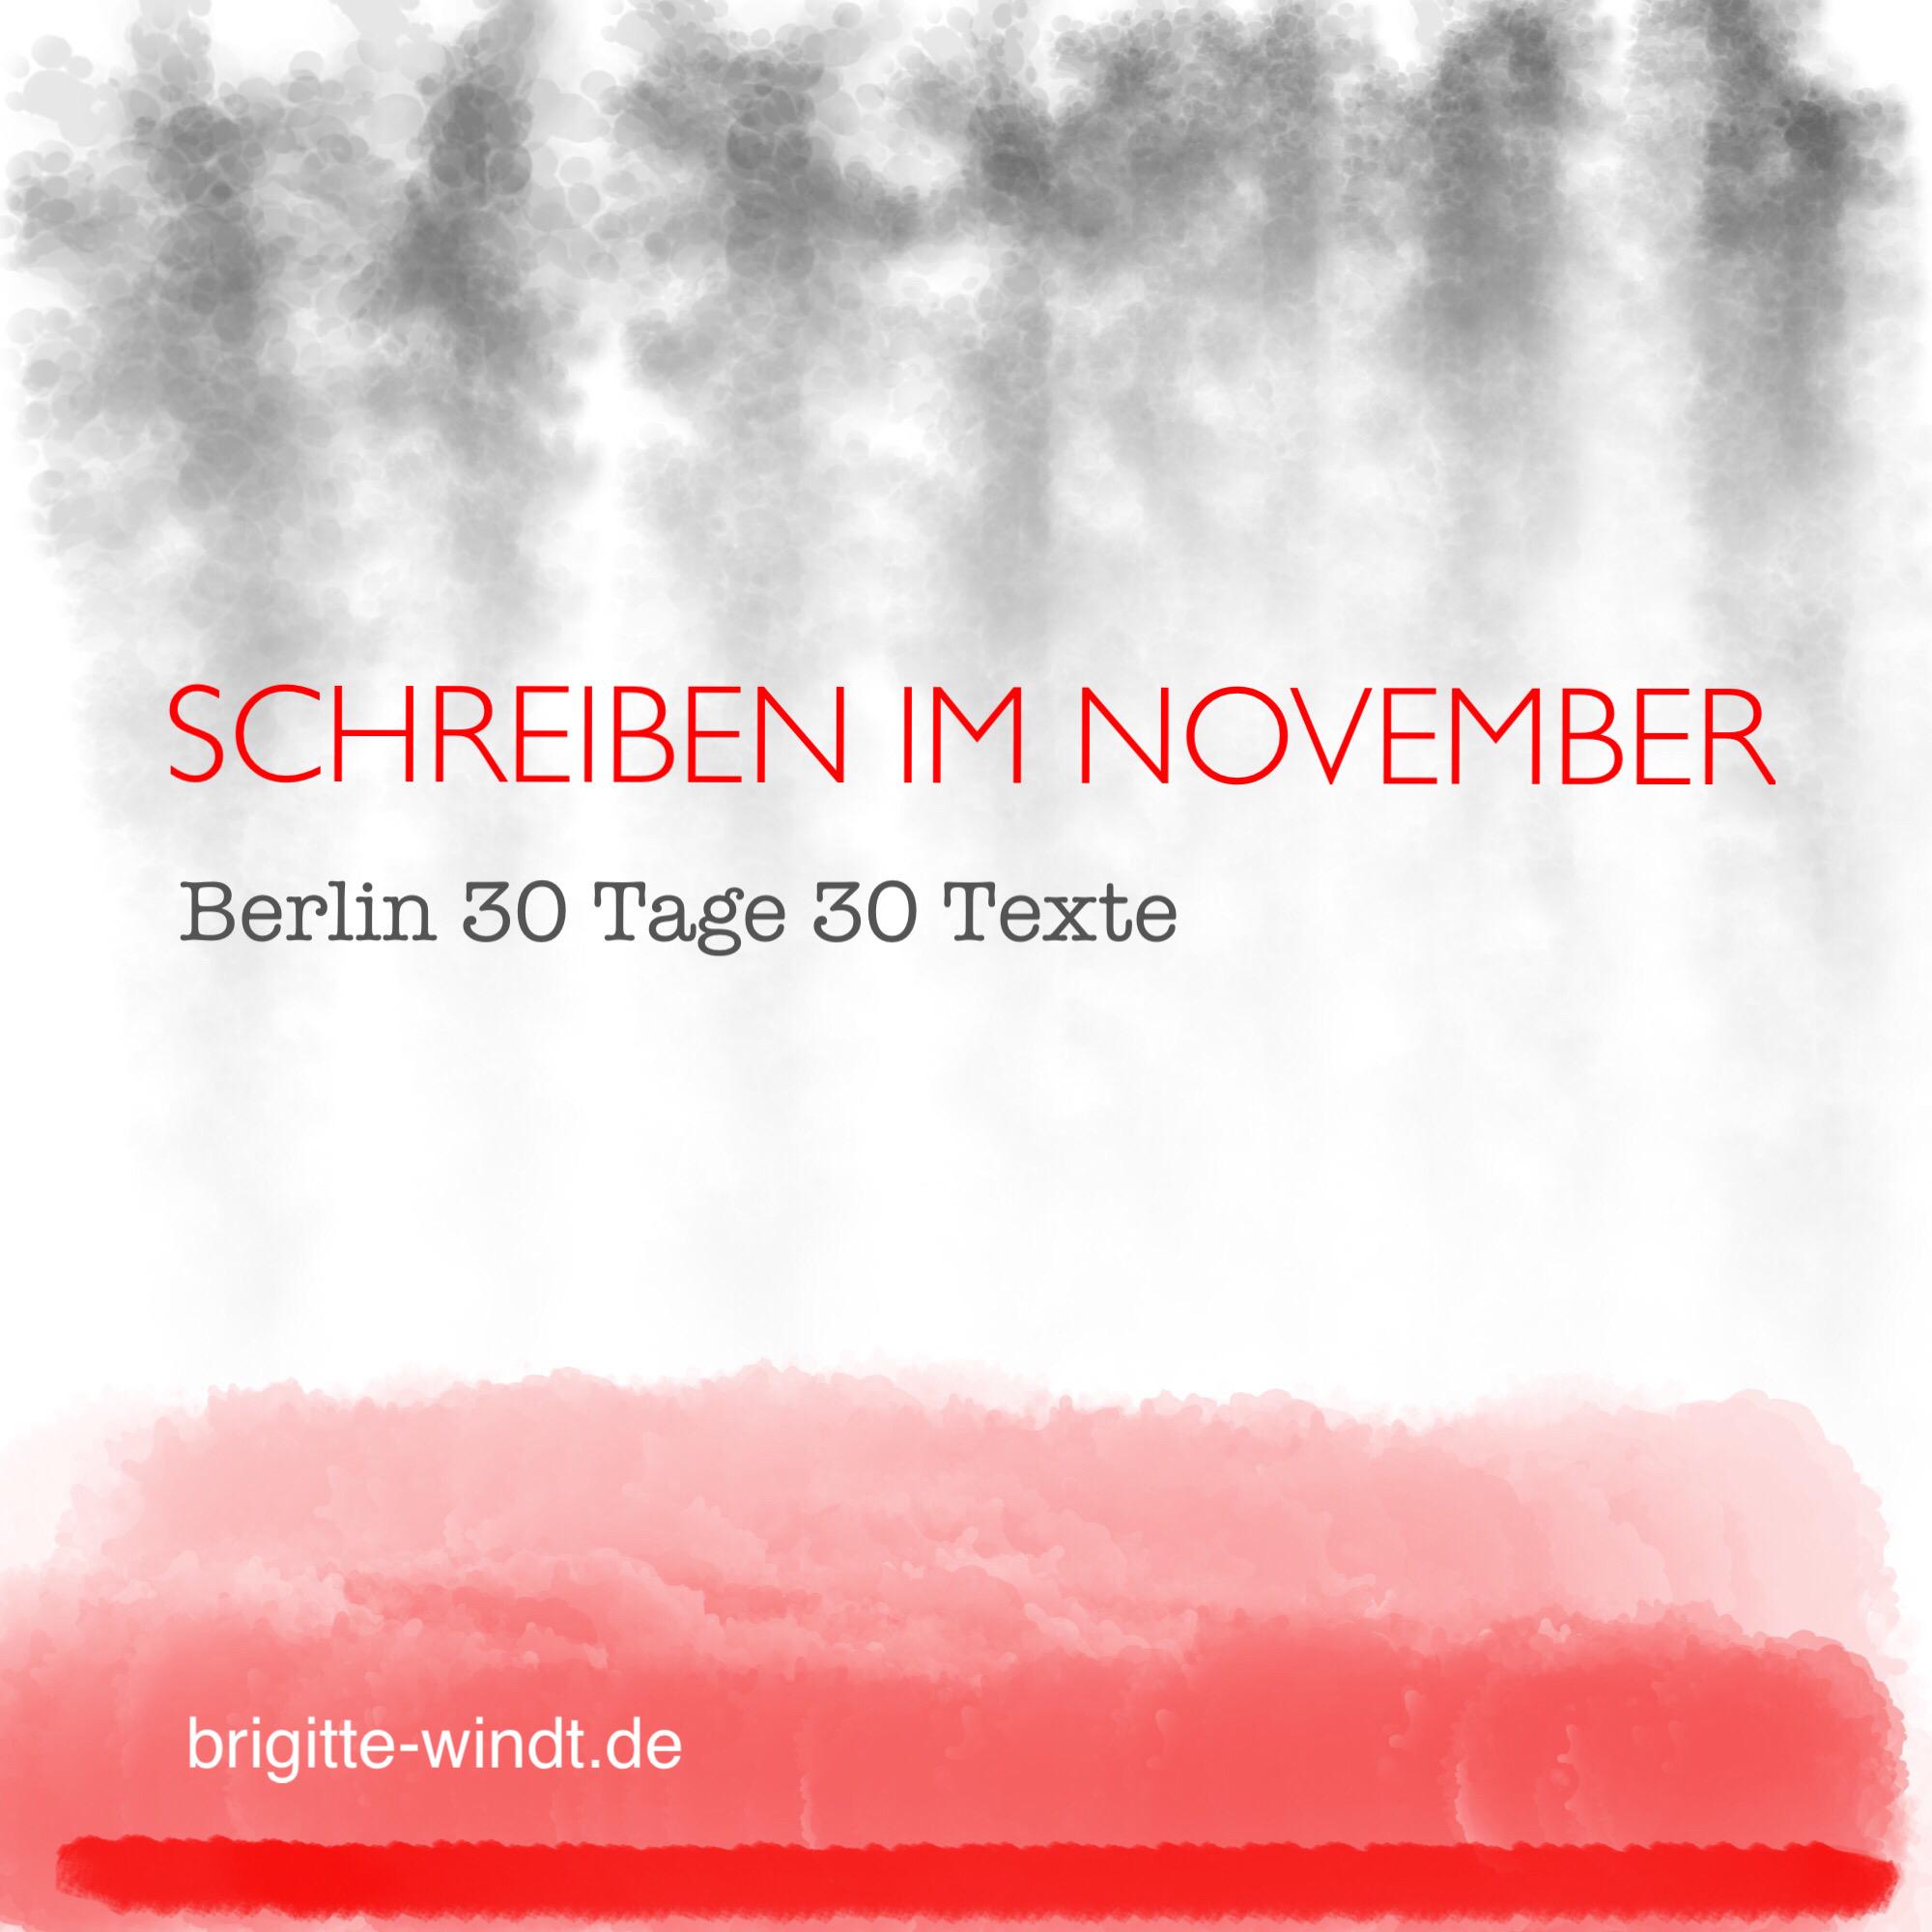 (c) Brigitte Windt 2018